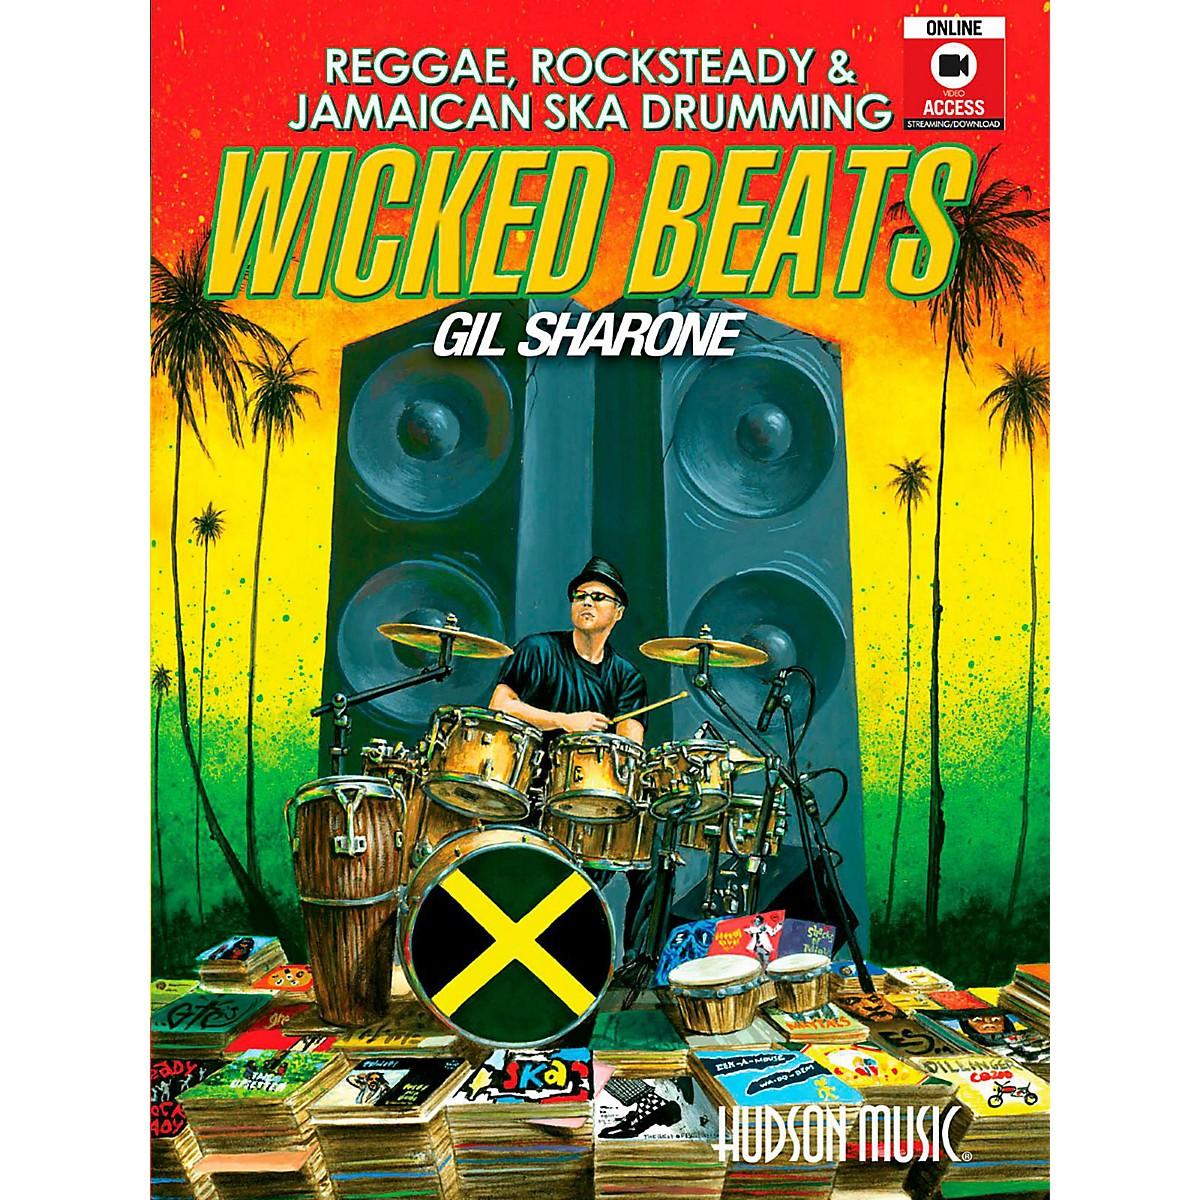 Hudson Music Wicked Beats: Jamaican Ska, Rocksteady & Reggae Drumming By Gil Sharone Book/DVD/Online